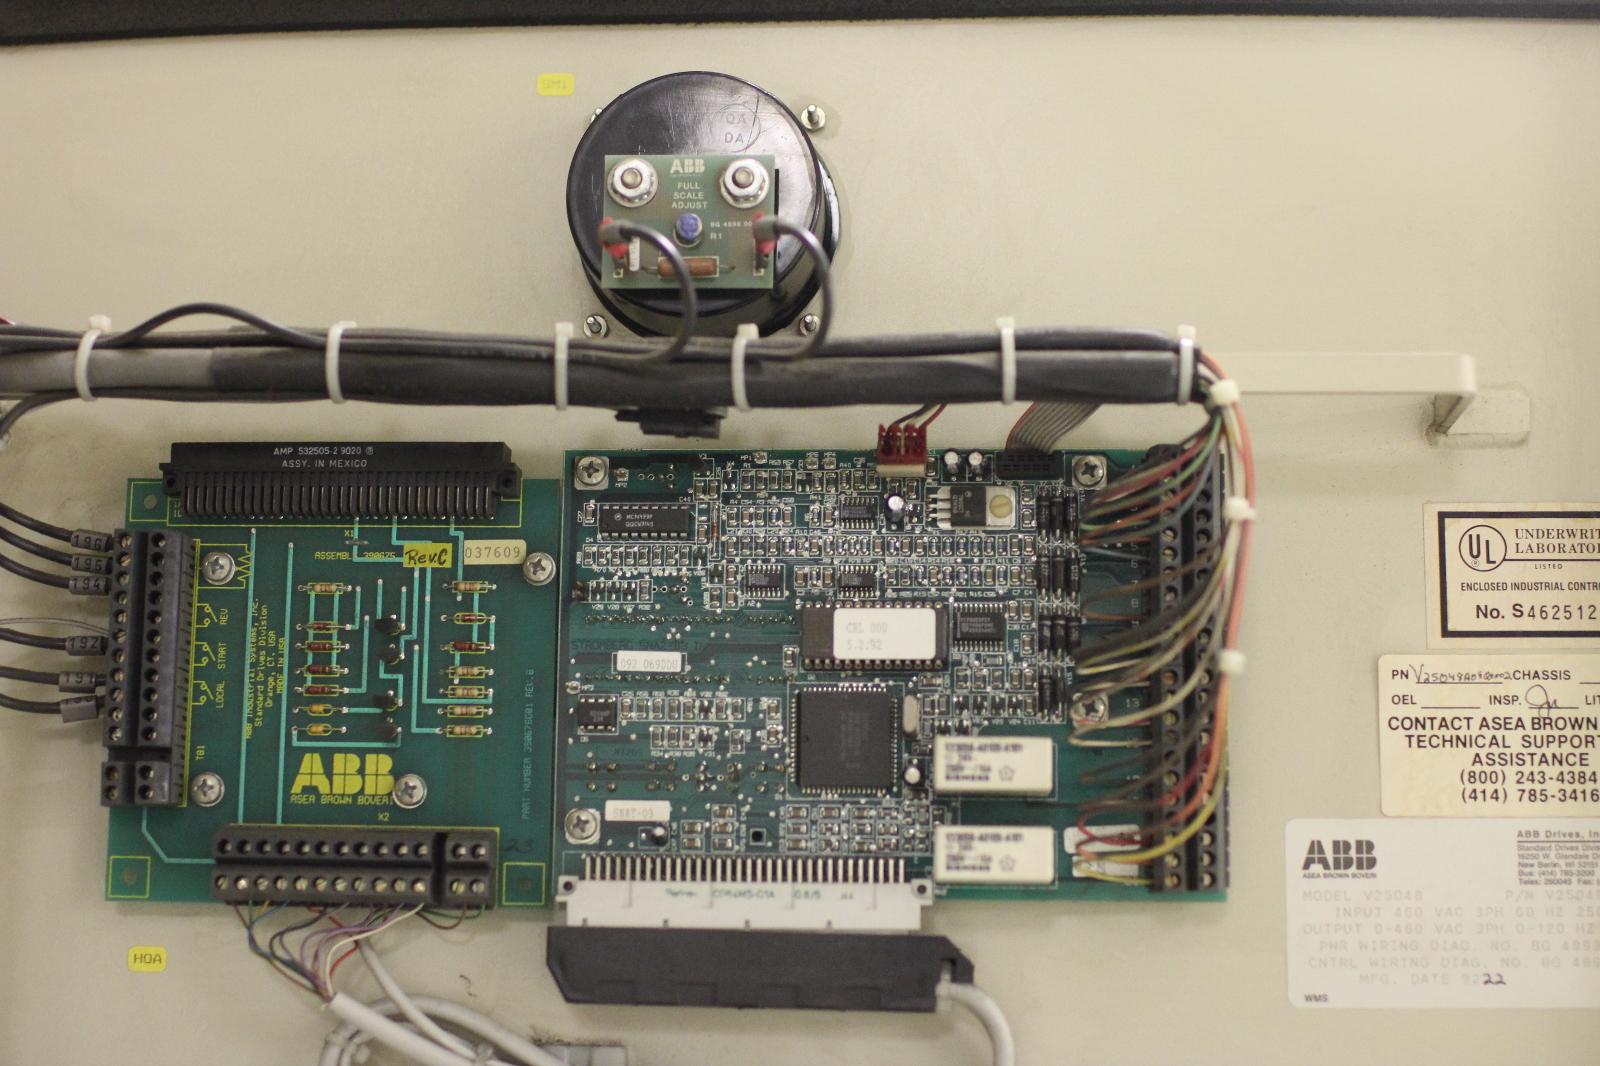 Used Abb Flowstar Ac Drive Vfd 200 Hp Motor Load